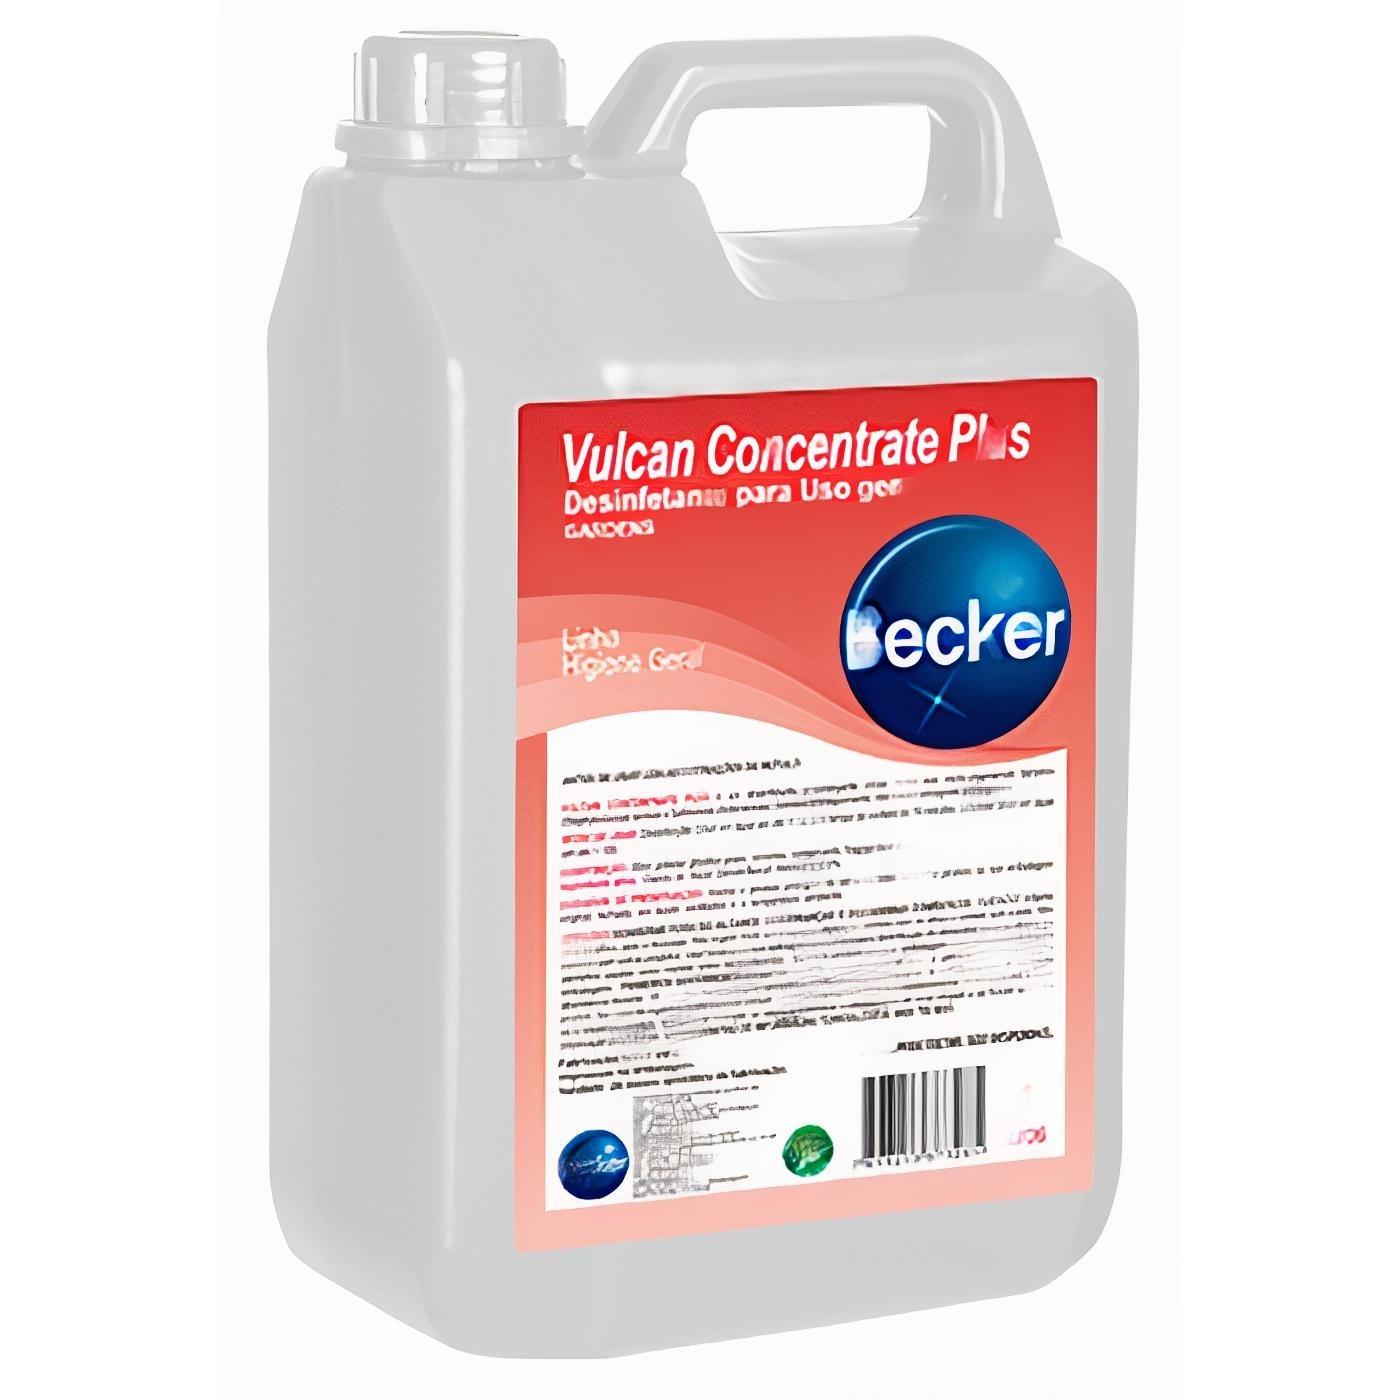 Desinfetante Vulcan Concetrate Plus 5L - Becker